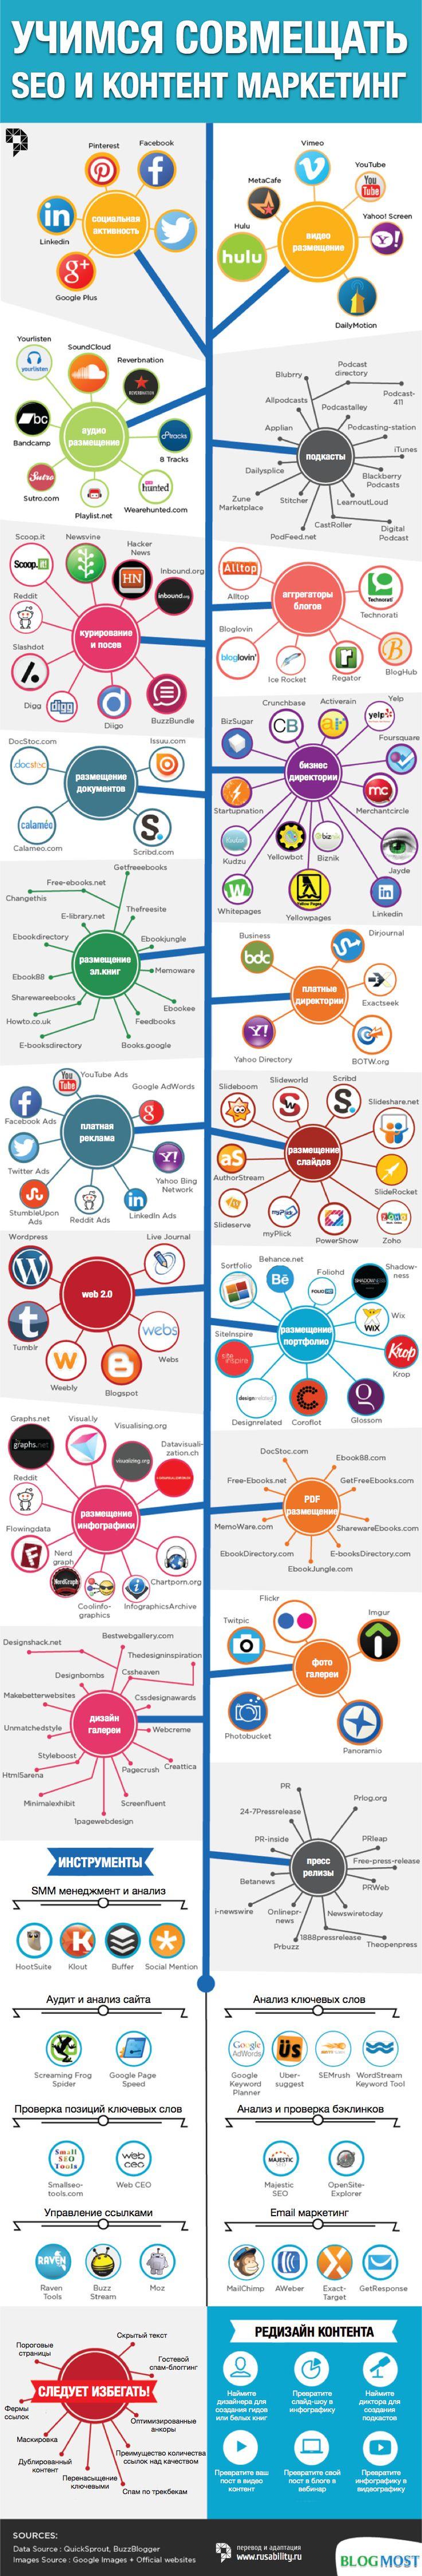 seo, контент маркетинг, инфографика, smm, соцсети